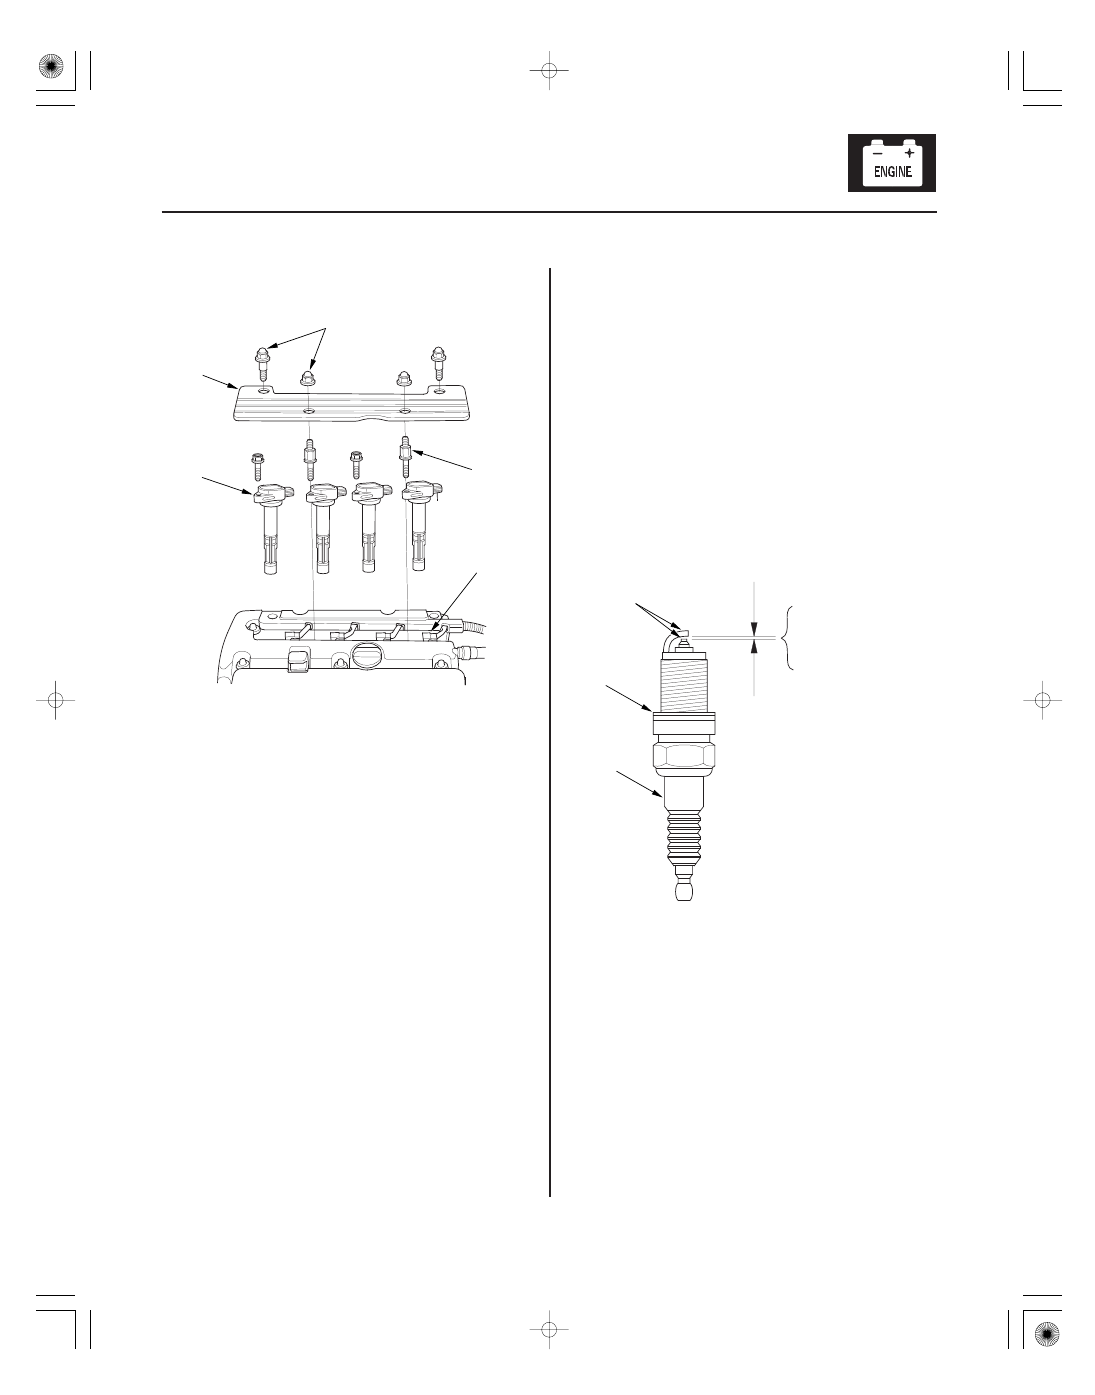 acura csx manual part 18 rh zinref ru Reinforced Concrete Design Manual WSDOT Design Manual